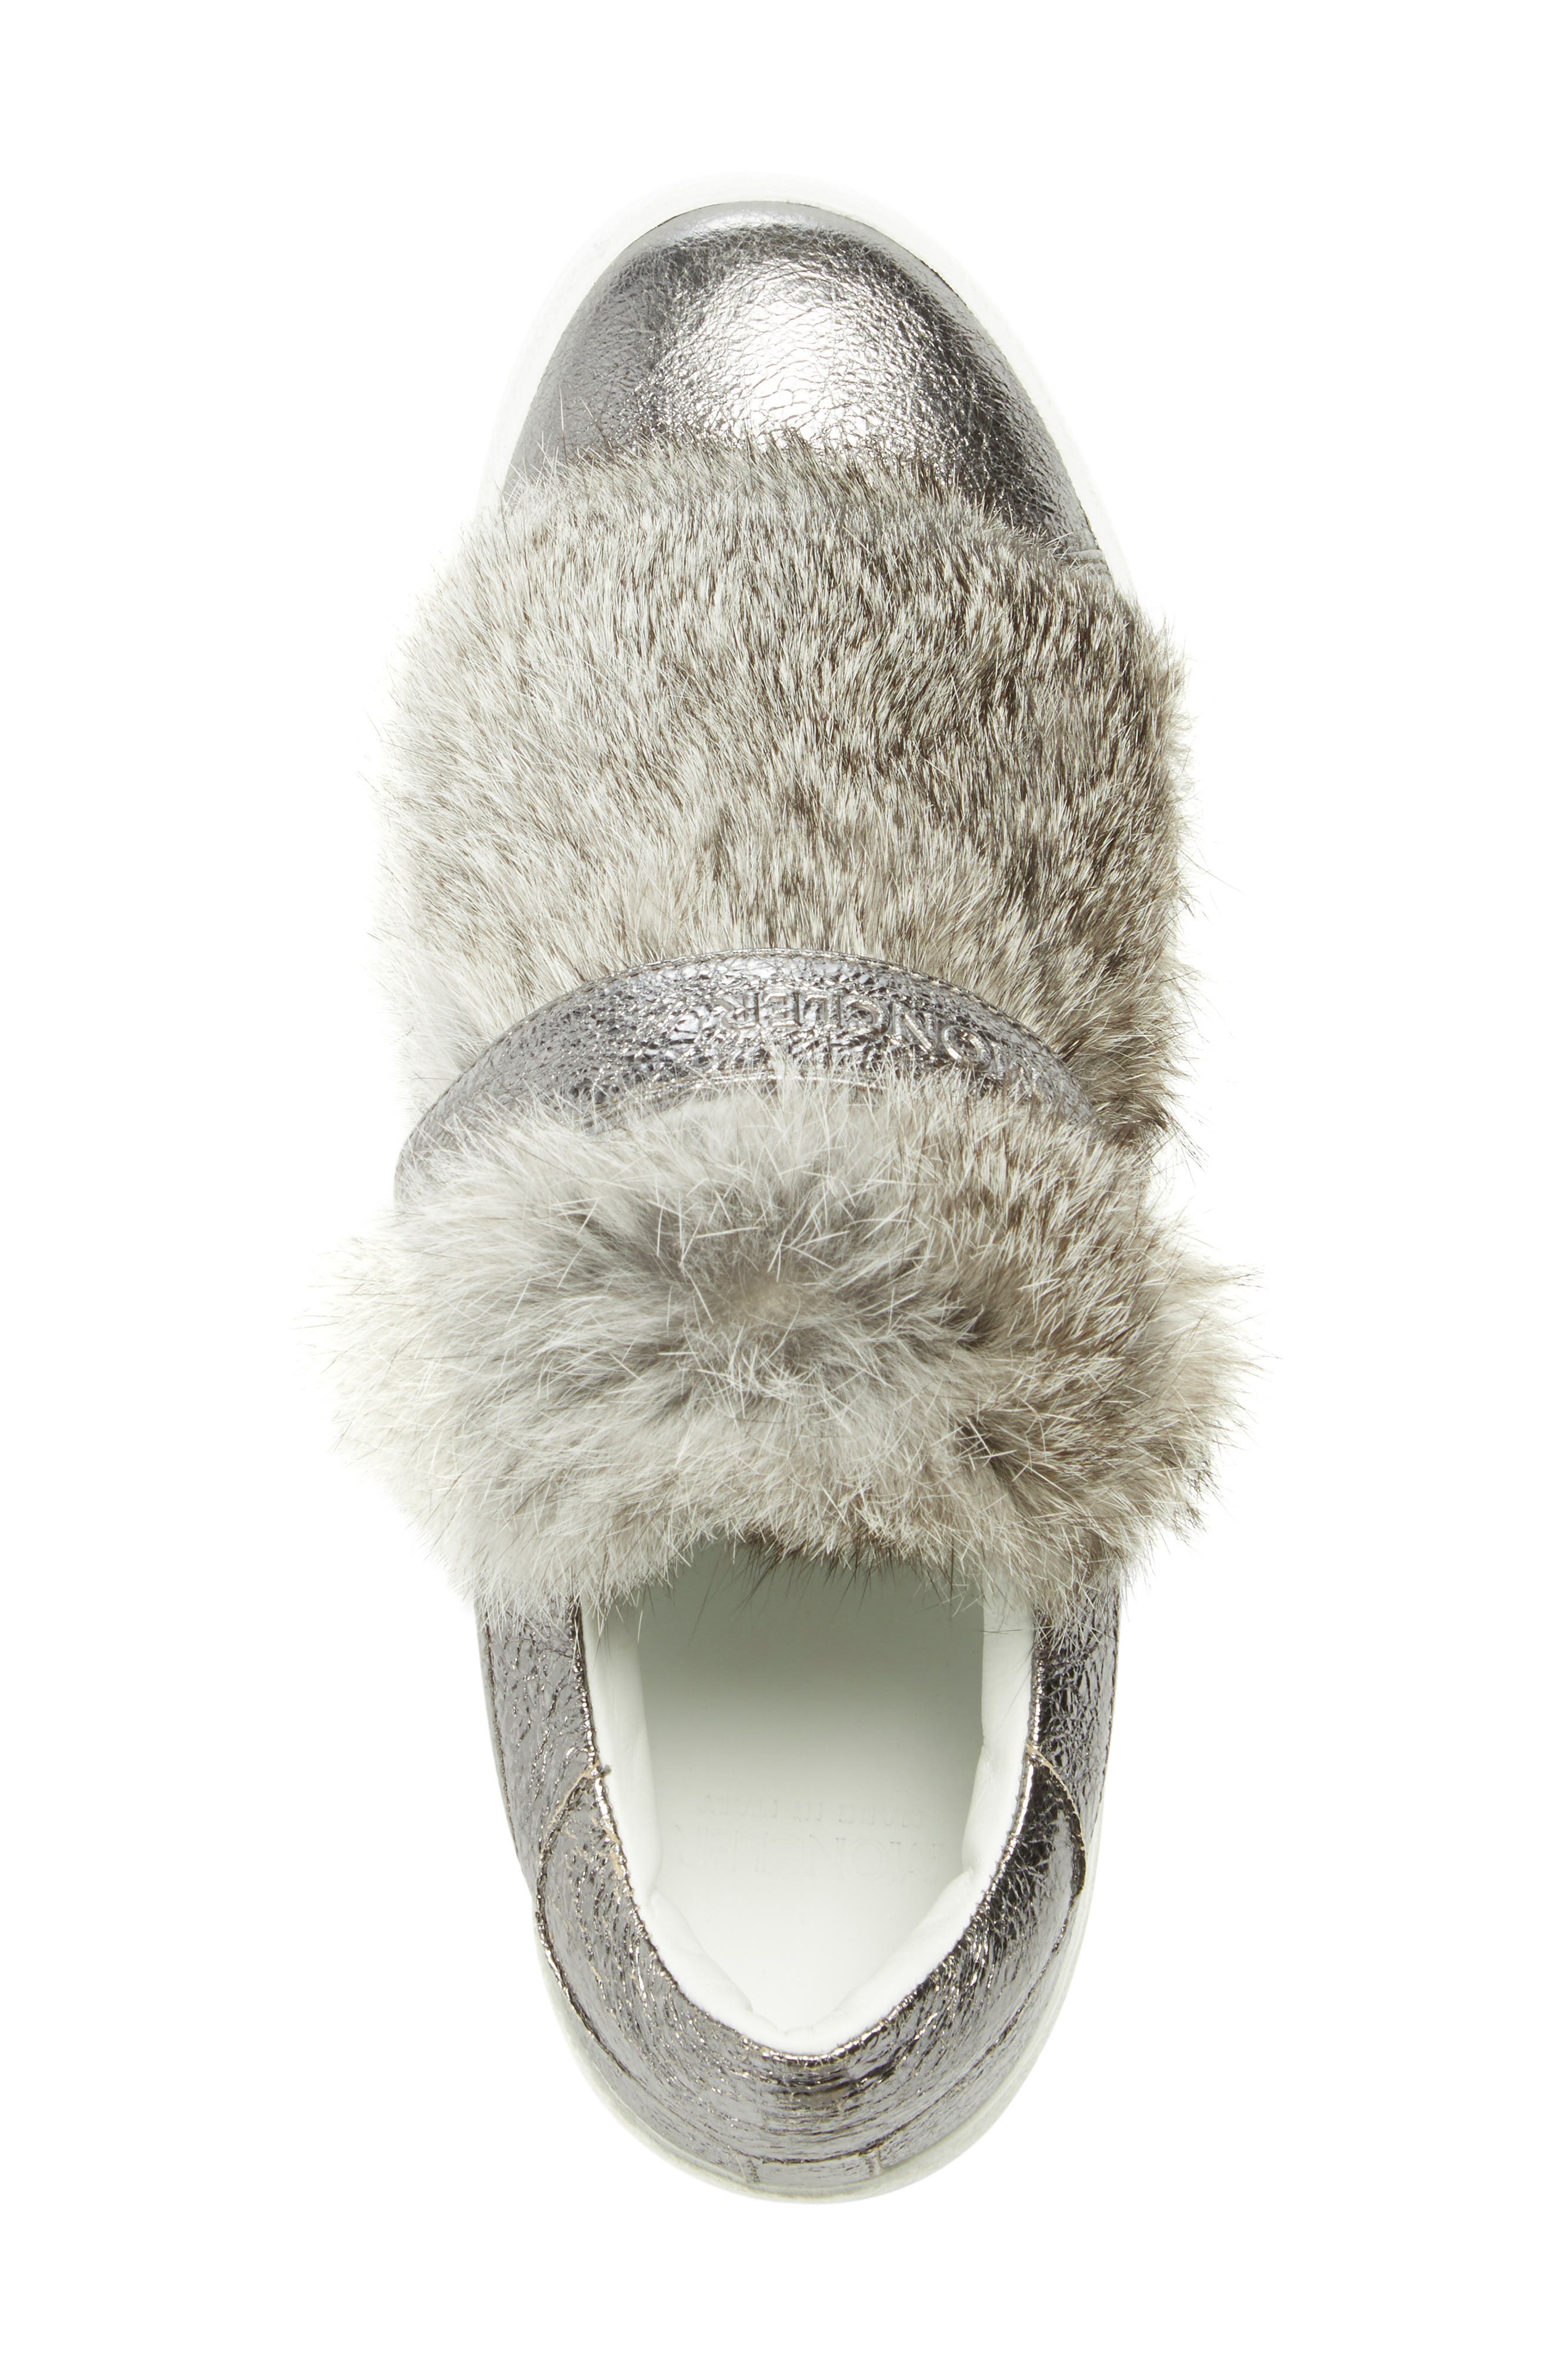 MONCLER, 'Lucie Scarpa' Genuine Rabbit Fur Trim Sneaker, Alternate thumbnail 2, color, 020